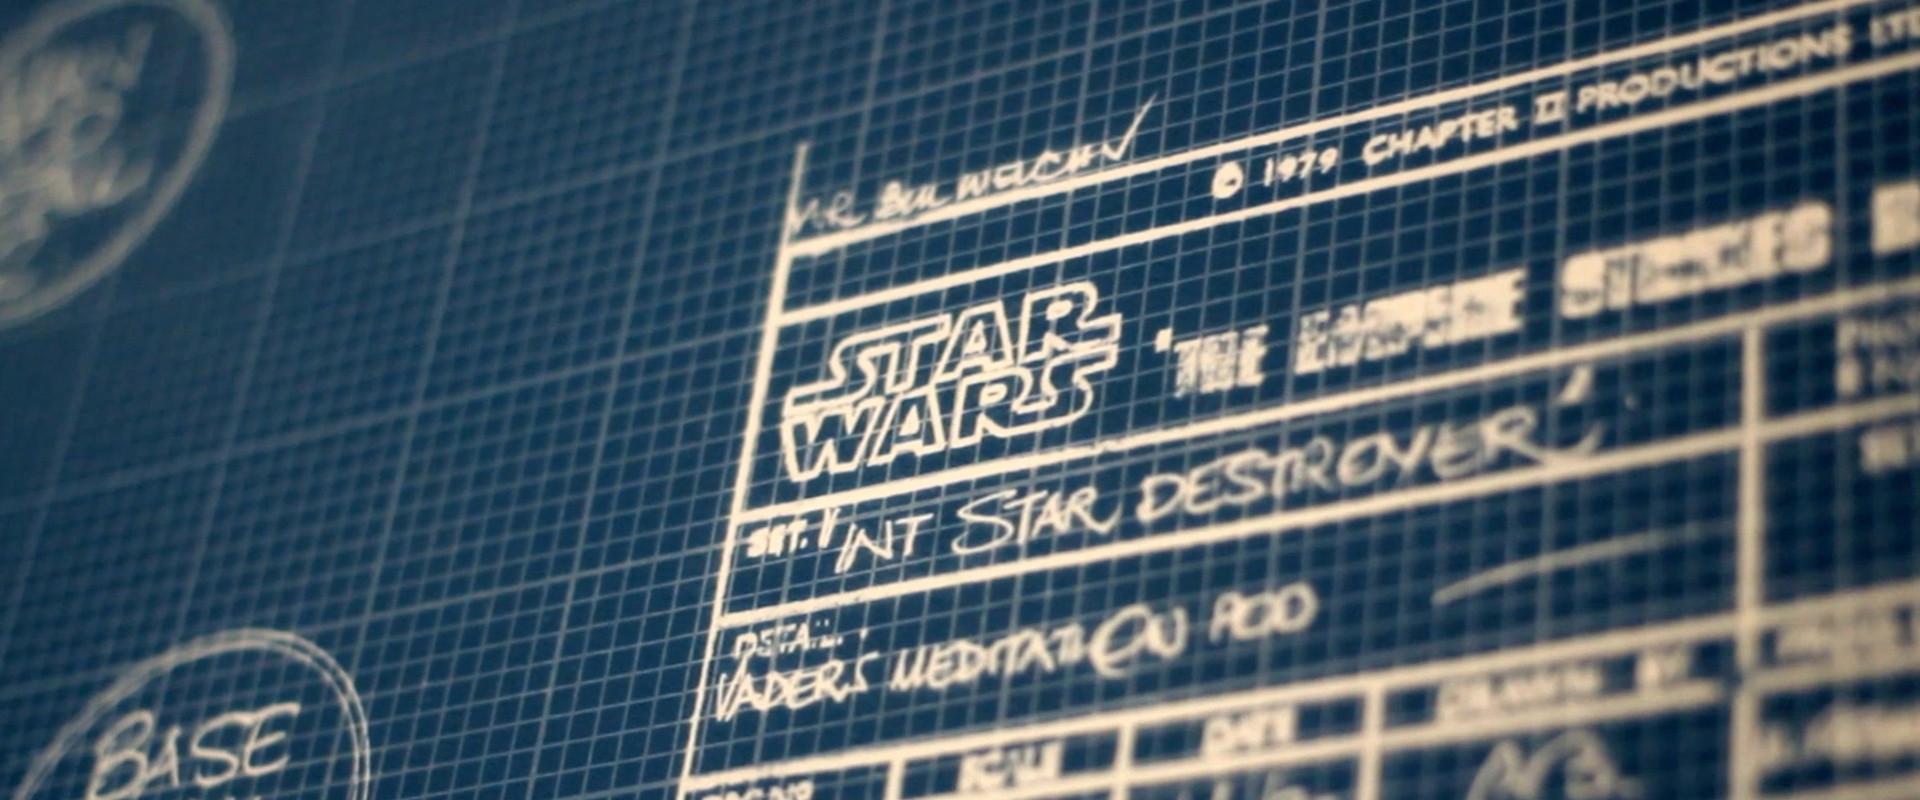 STAR WARS 3.jpg